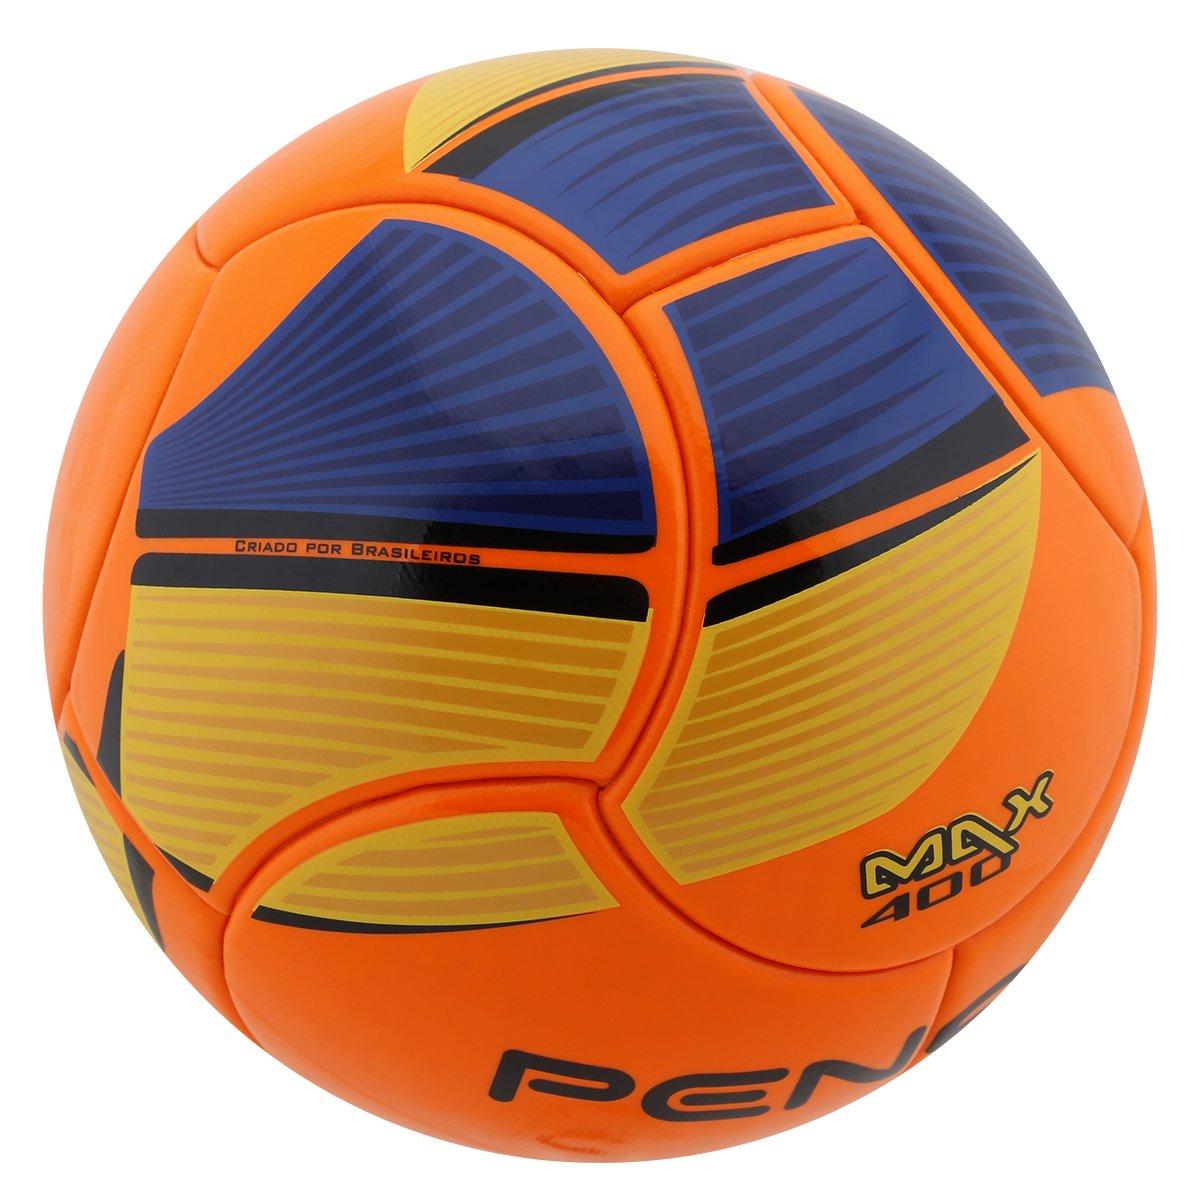 Bola Futebol Penalty Max 400 5 Futsal - Compre Agora  d7de3924a2bb4